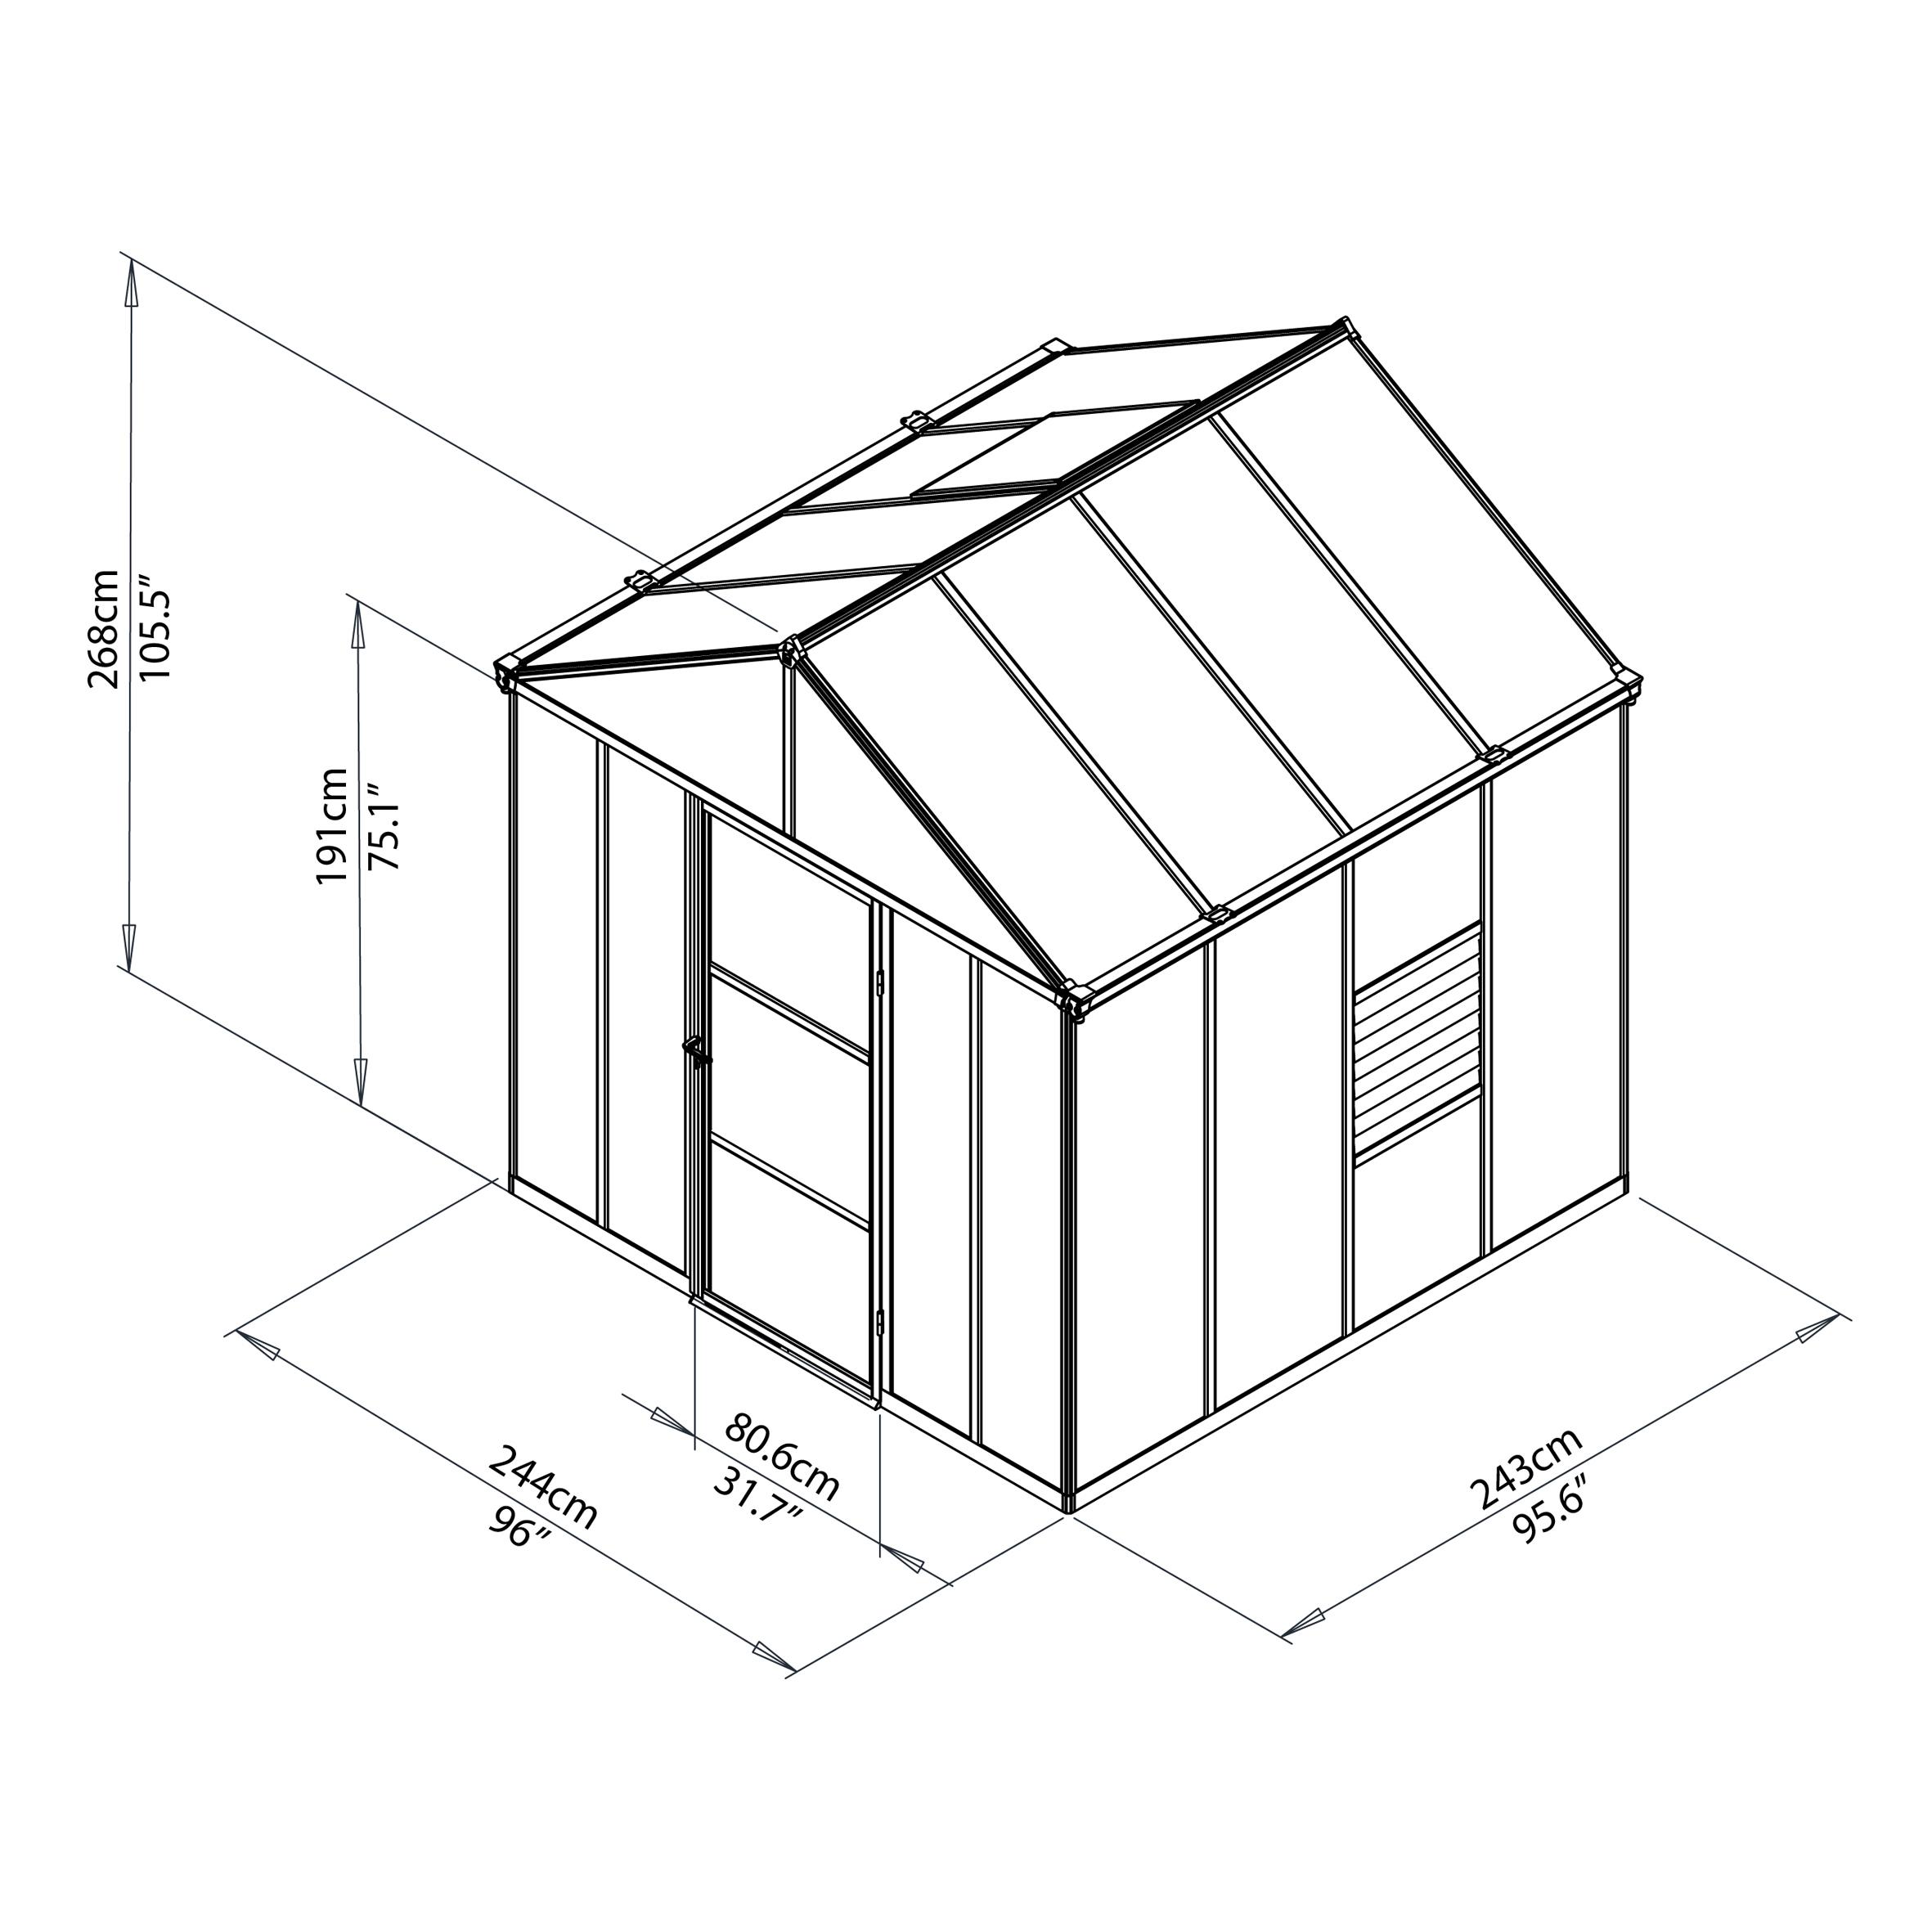 palram-greenhouses-glory-8x8-drawing-isoview.jpg